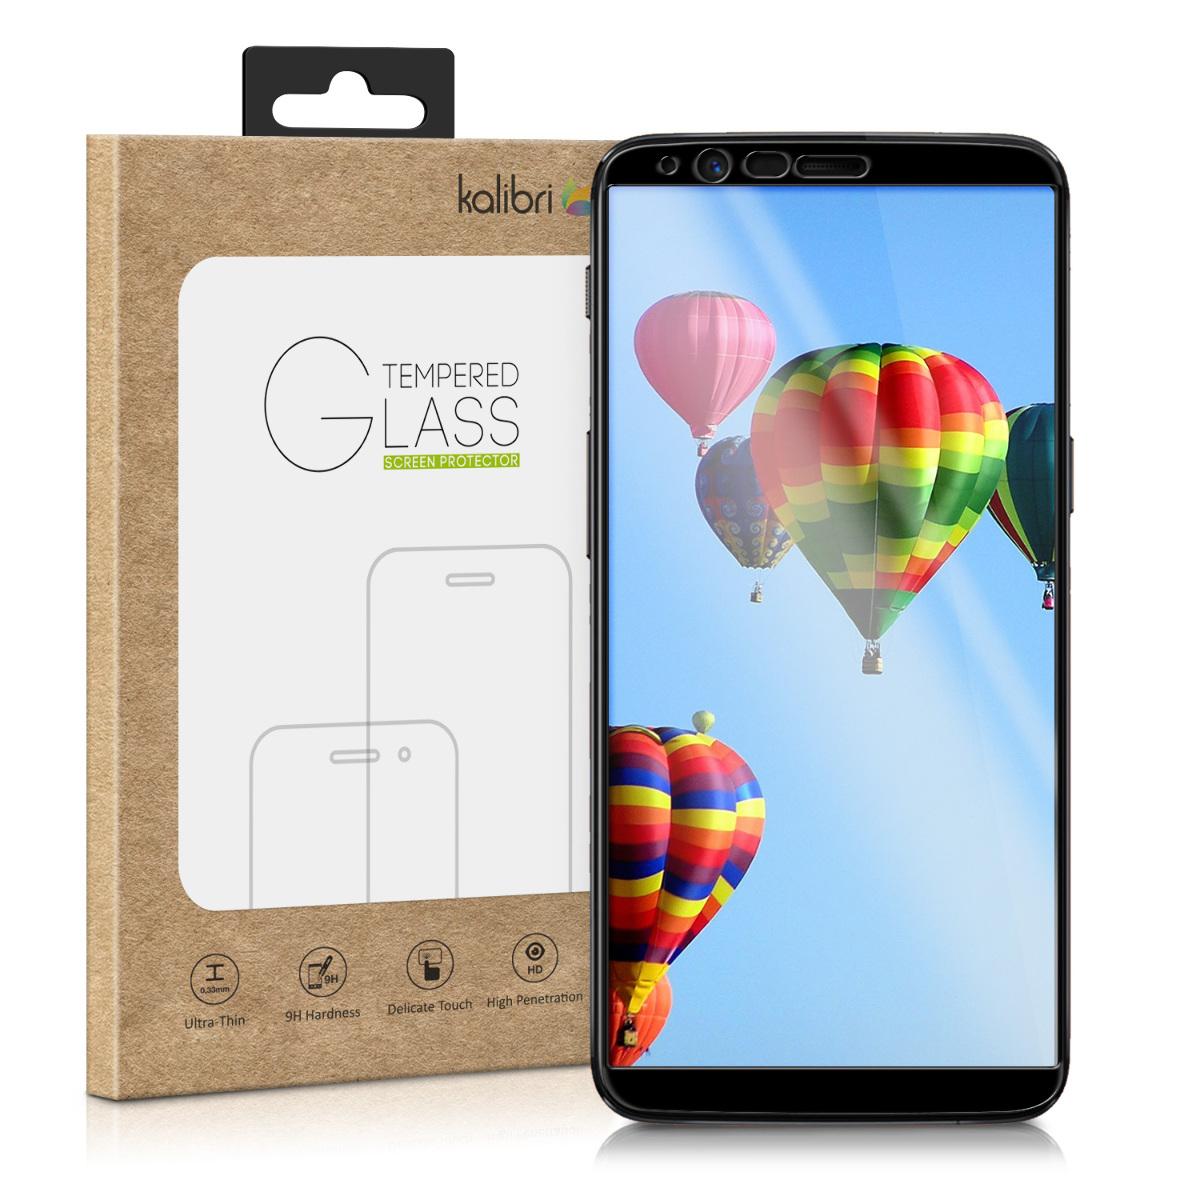 Kalibri Tempered Glass - Fullface Αντιχαρακτικό Γυαλί Οθόνης OnePlus 5T - Black (43759.01)